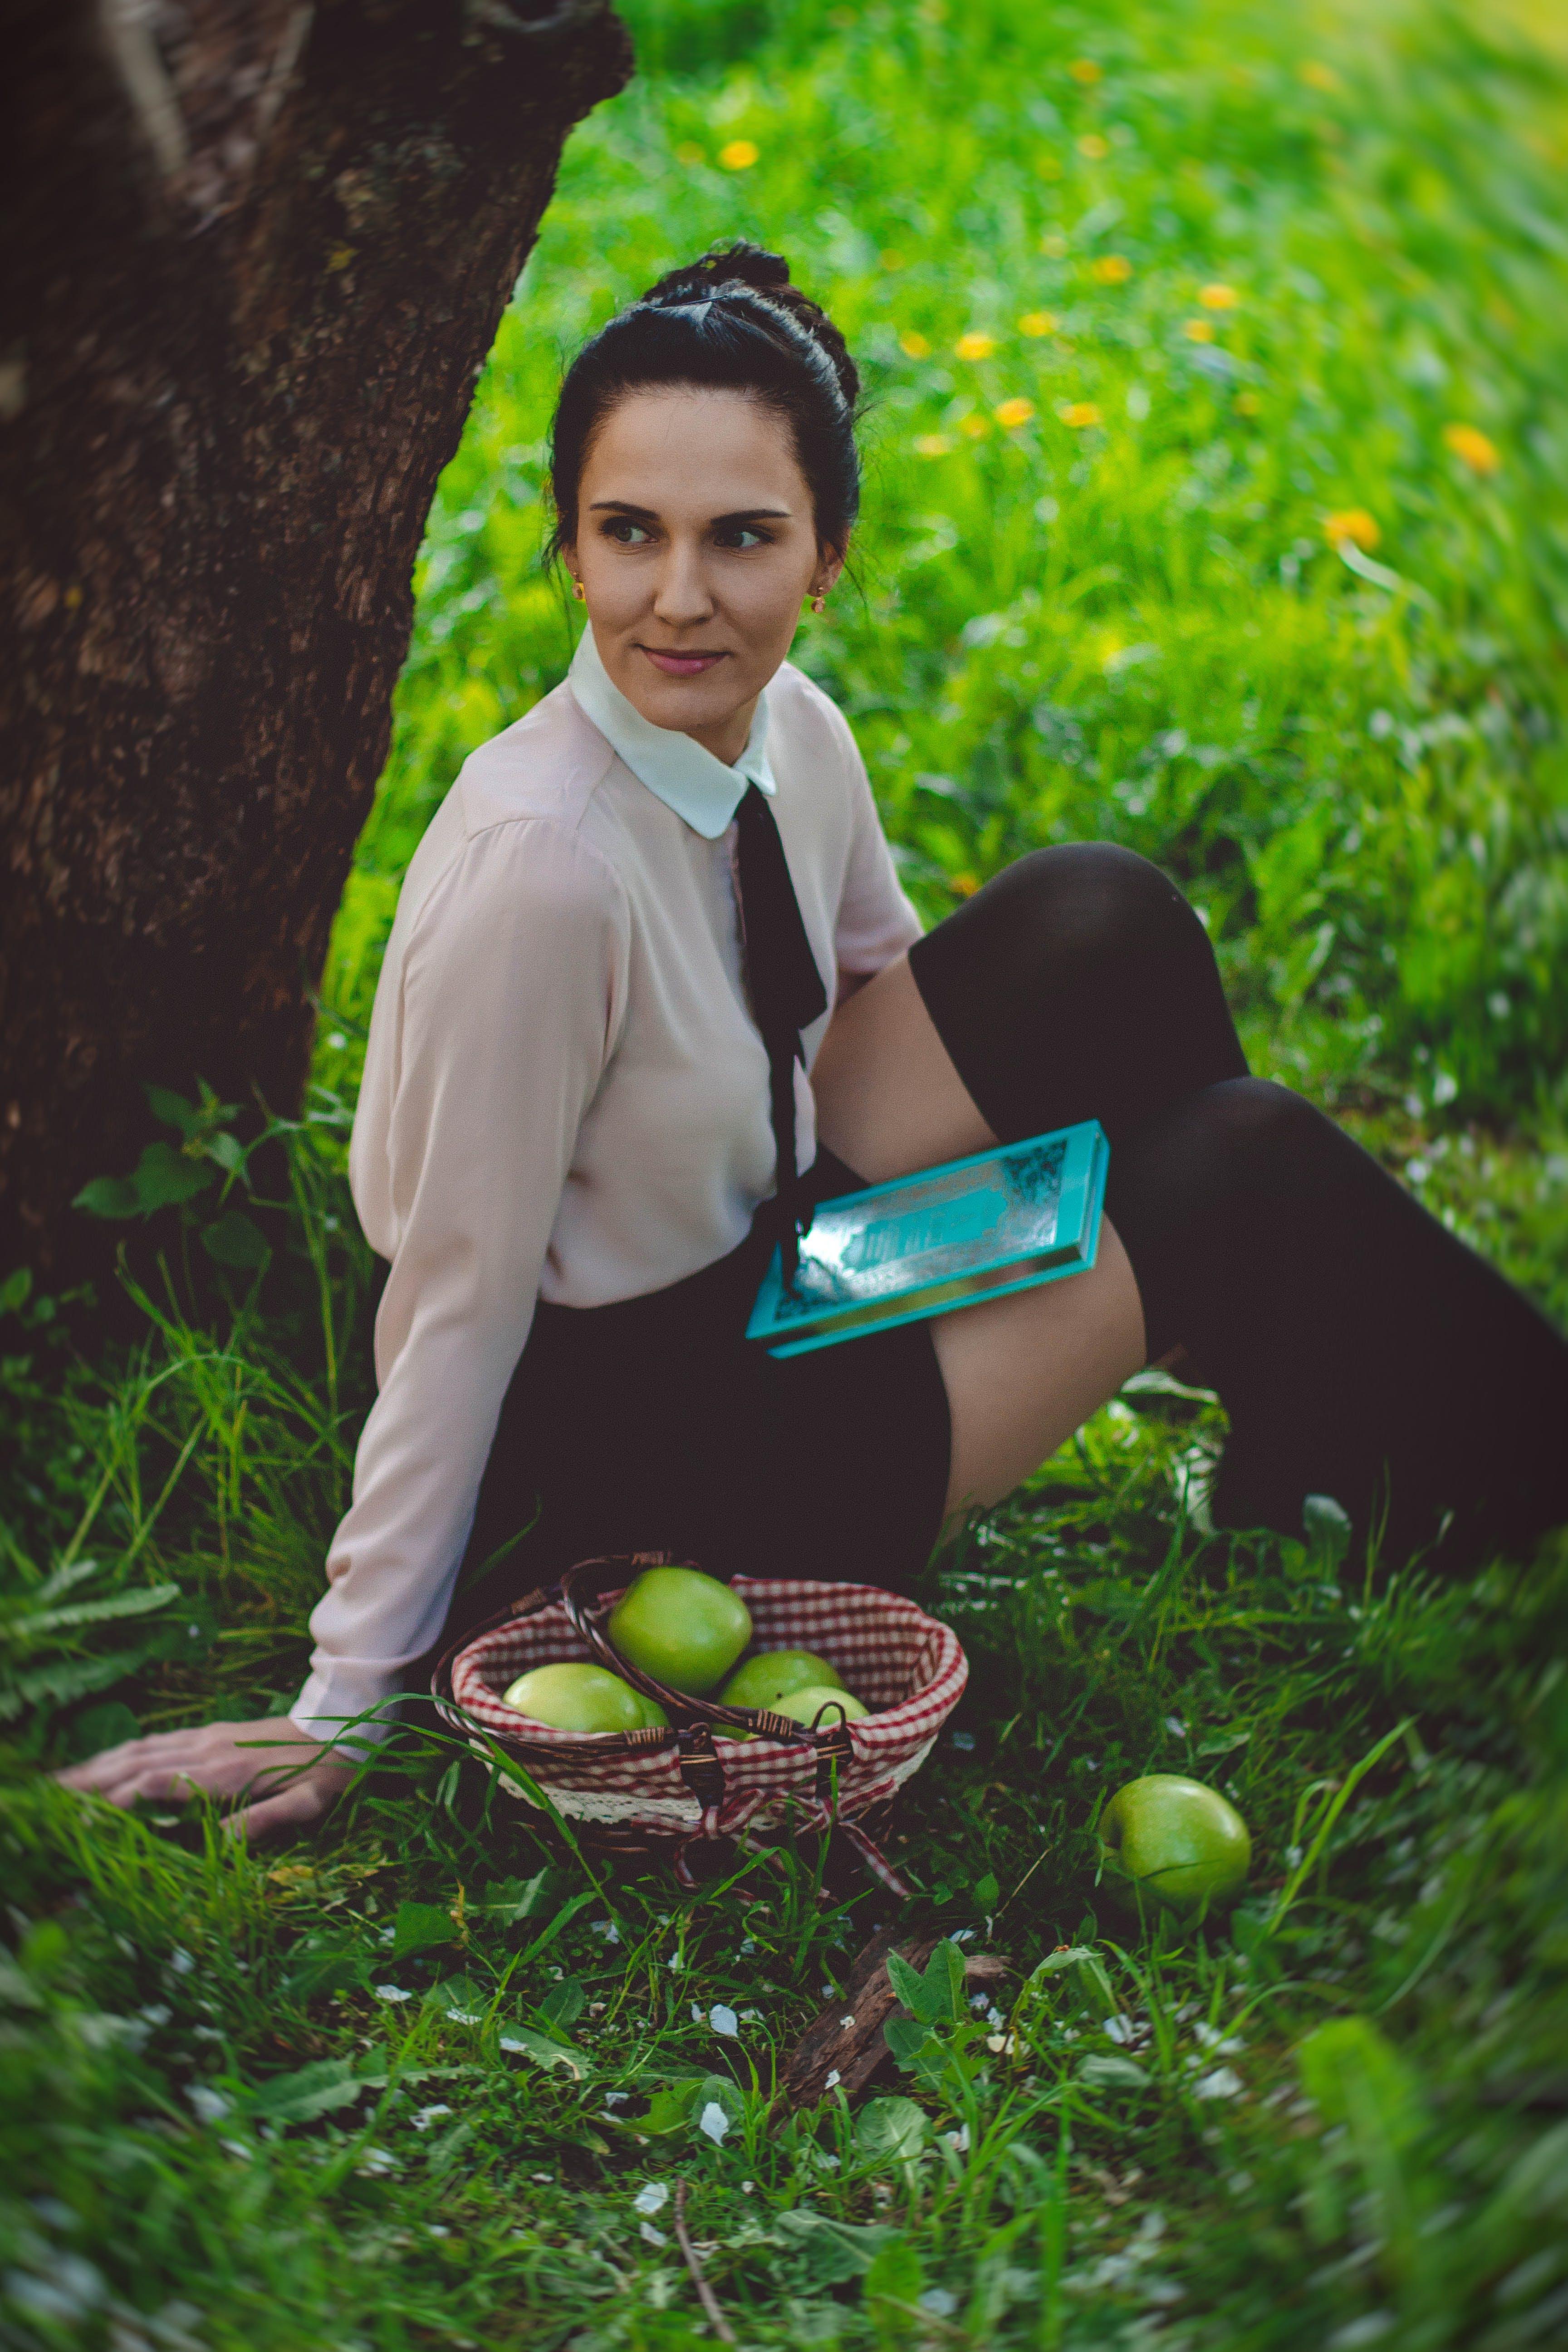 Woman Weasring White Dress Shirt Sitting in Green Grass Under Brown Large Tree